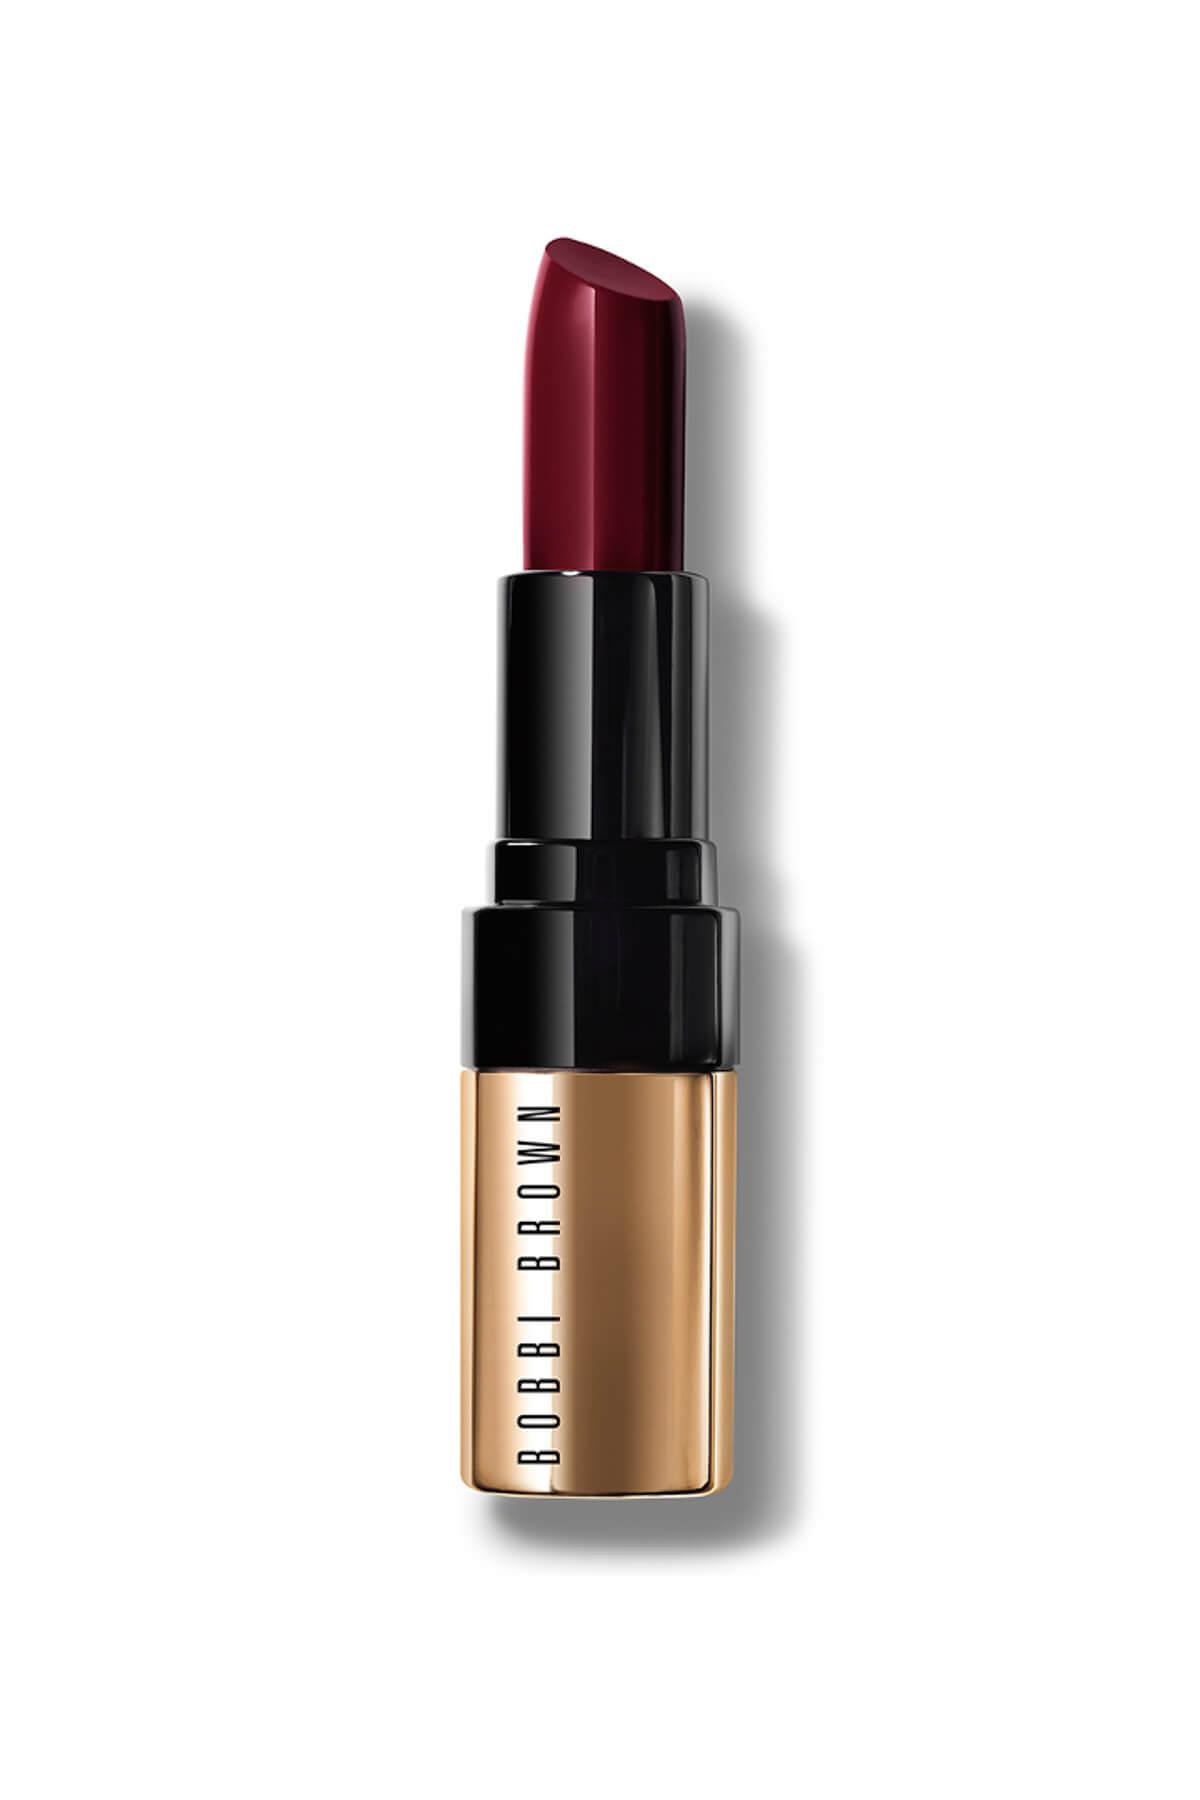 BOBBI BROWN Ruj - Luxe Lip Color Plum Brandy 3.8 g 716170150383 1